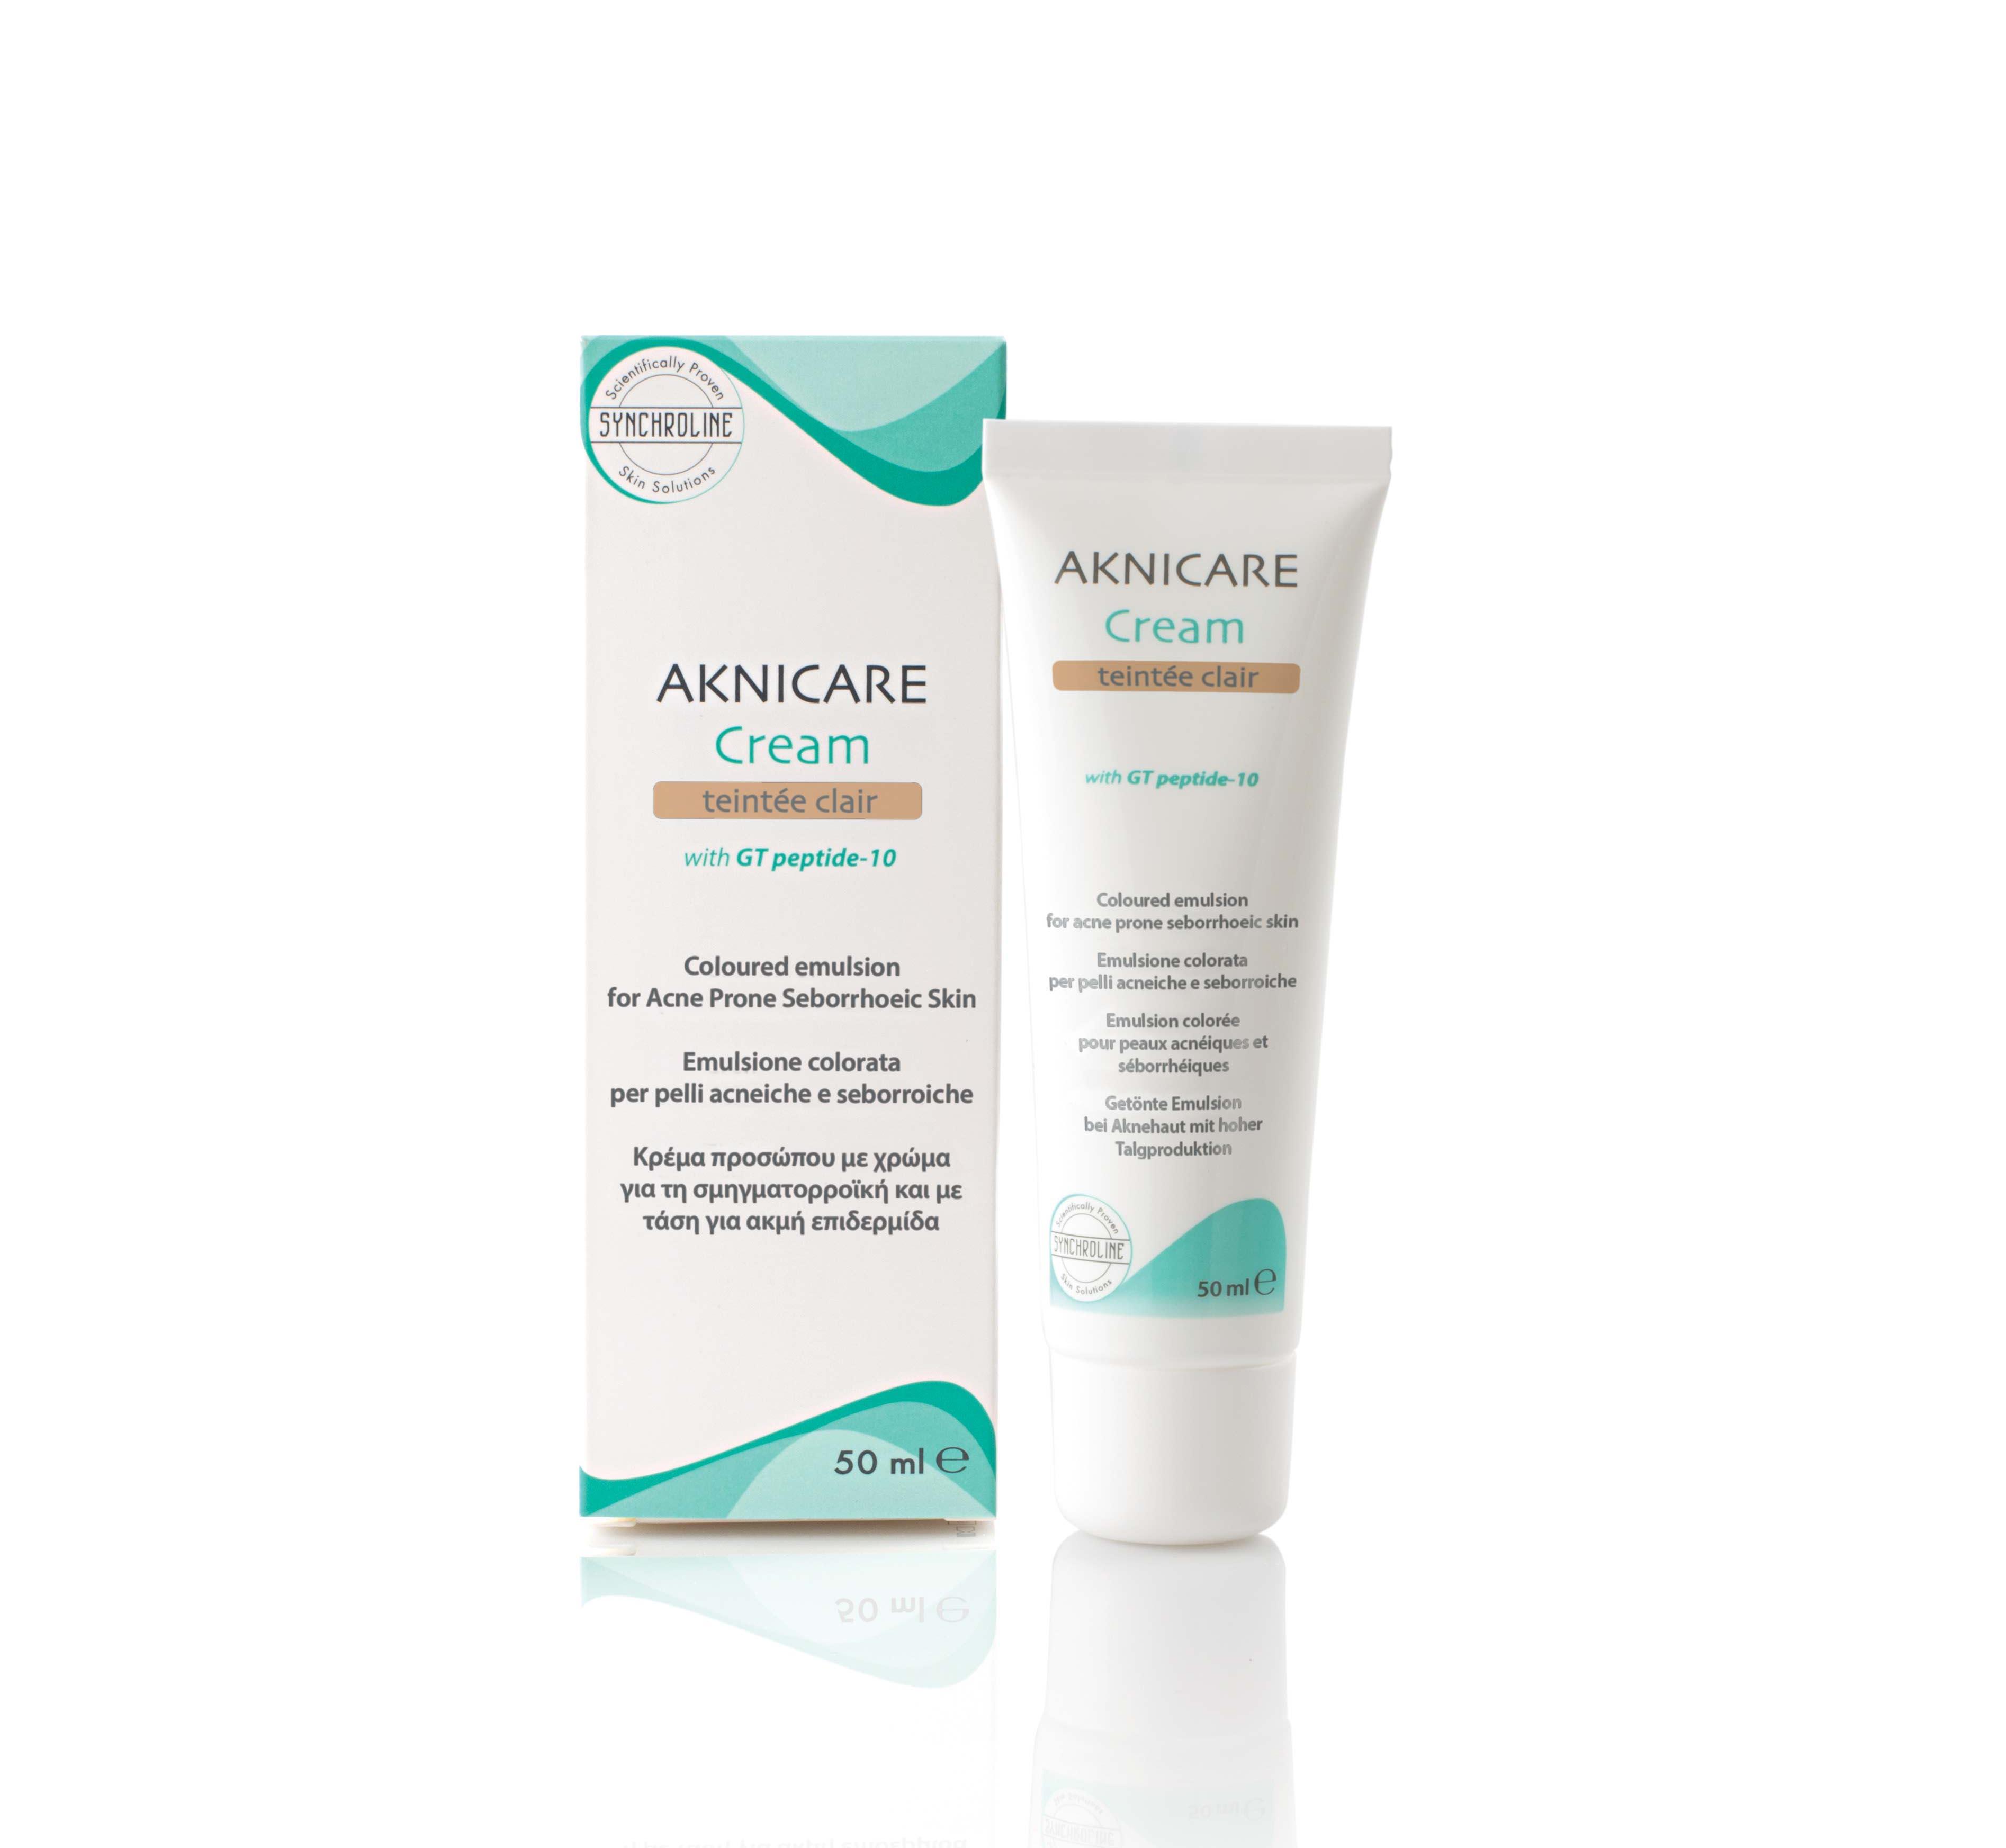 Synchroline Aknicare Cream Teintee Dore, 50 ml